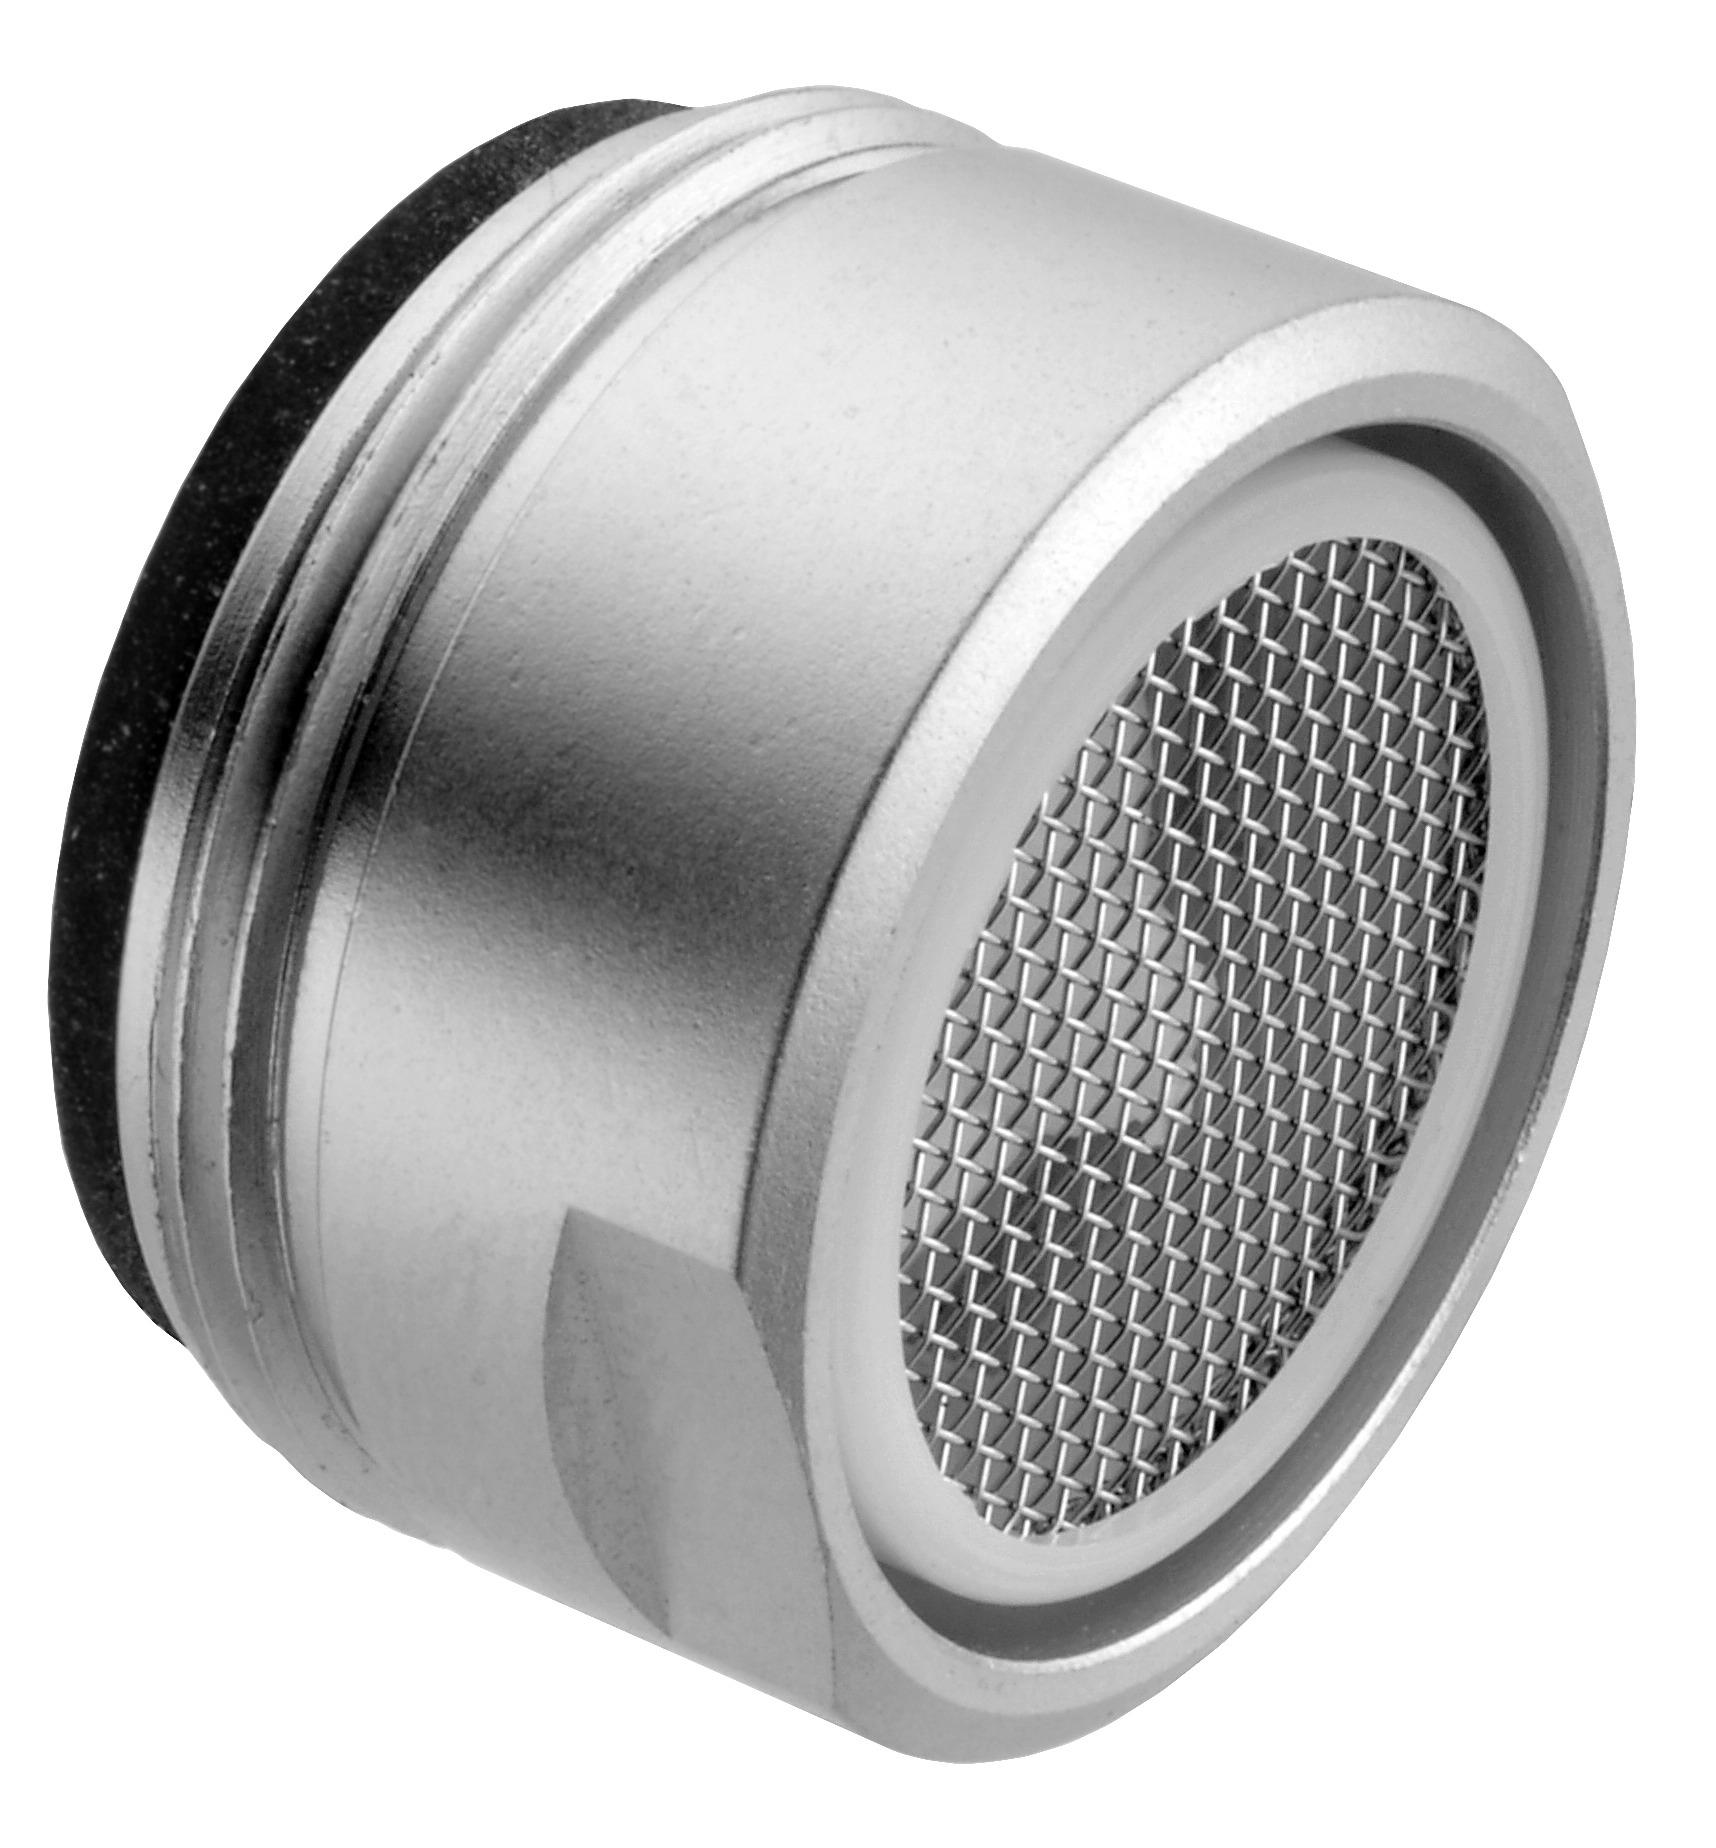 Luftsprudler M24/1 AG chrom-matt Bild 1